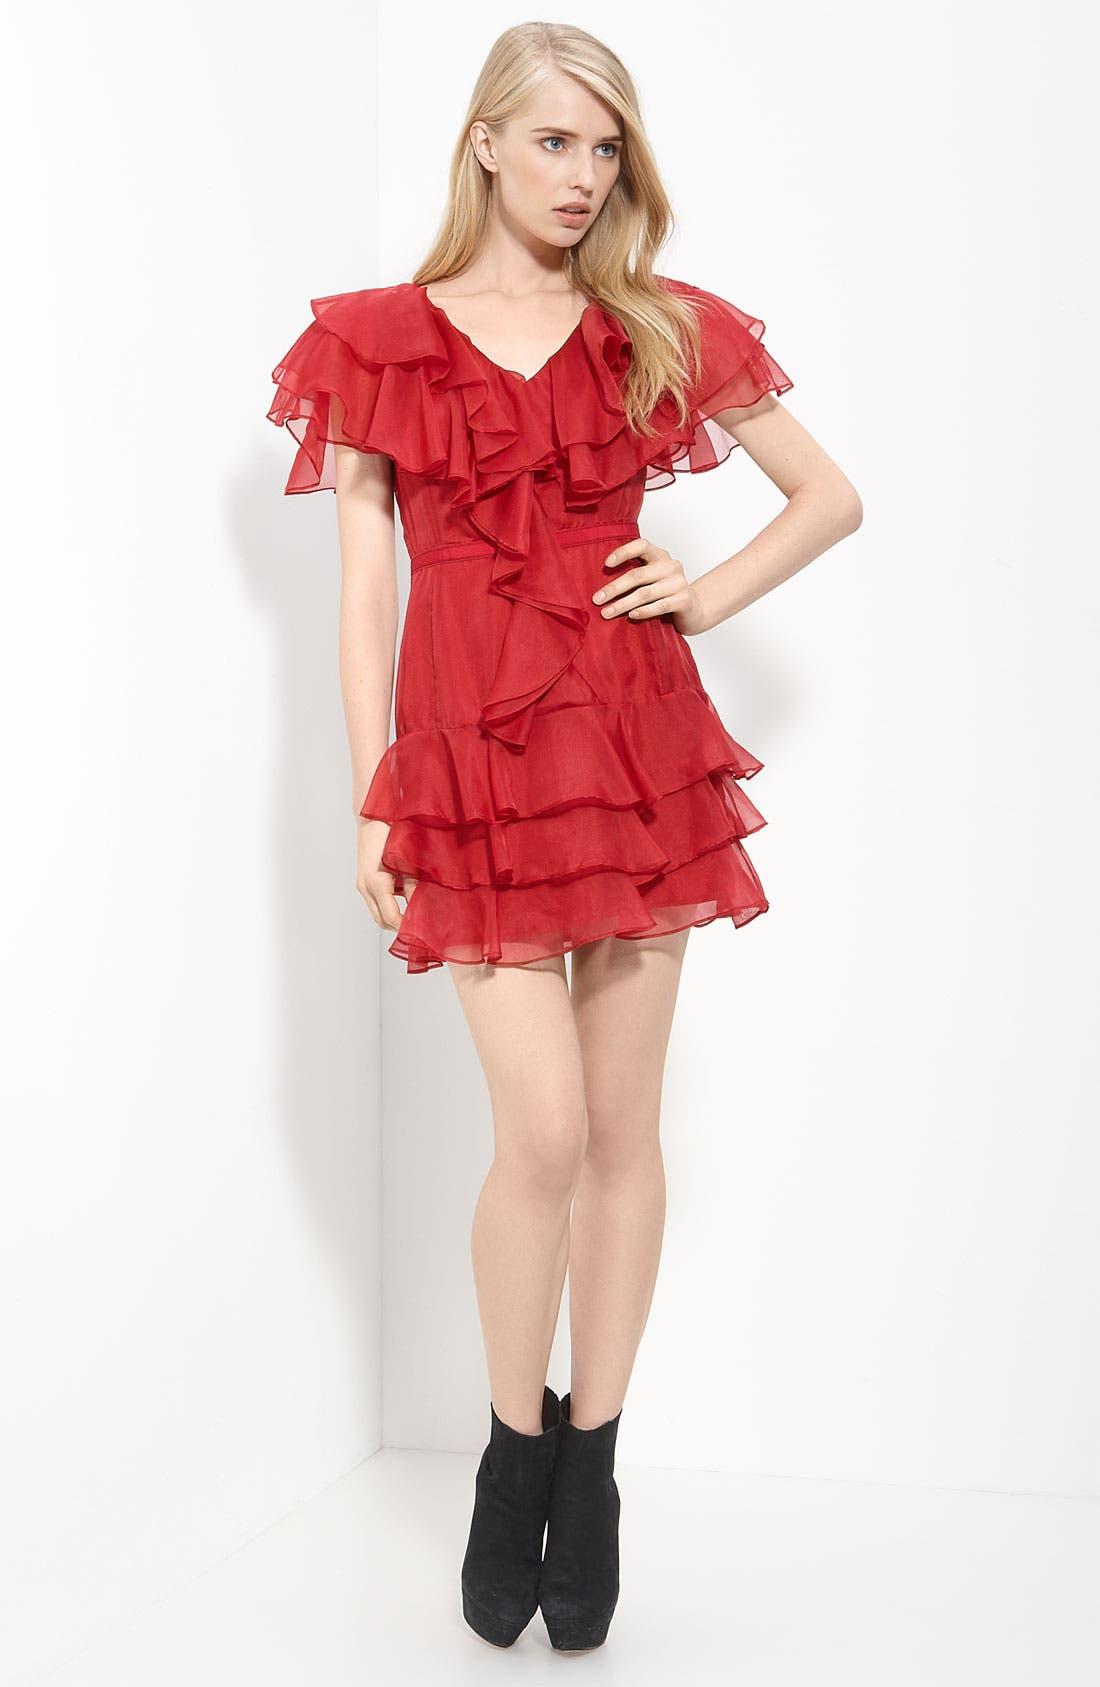 Alternate Image 1 Selected - Rachel Zoe Tiered Organza Dress